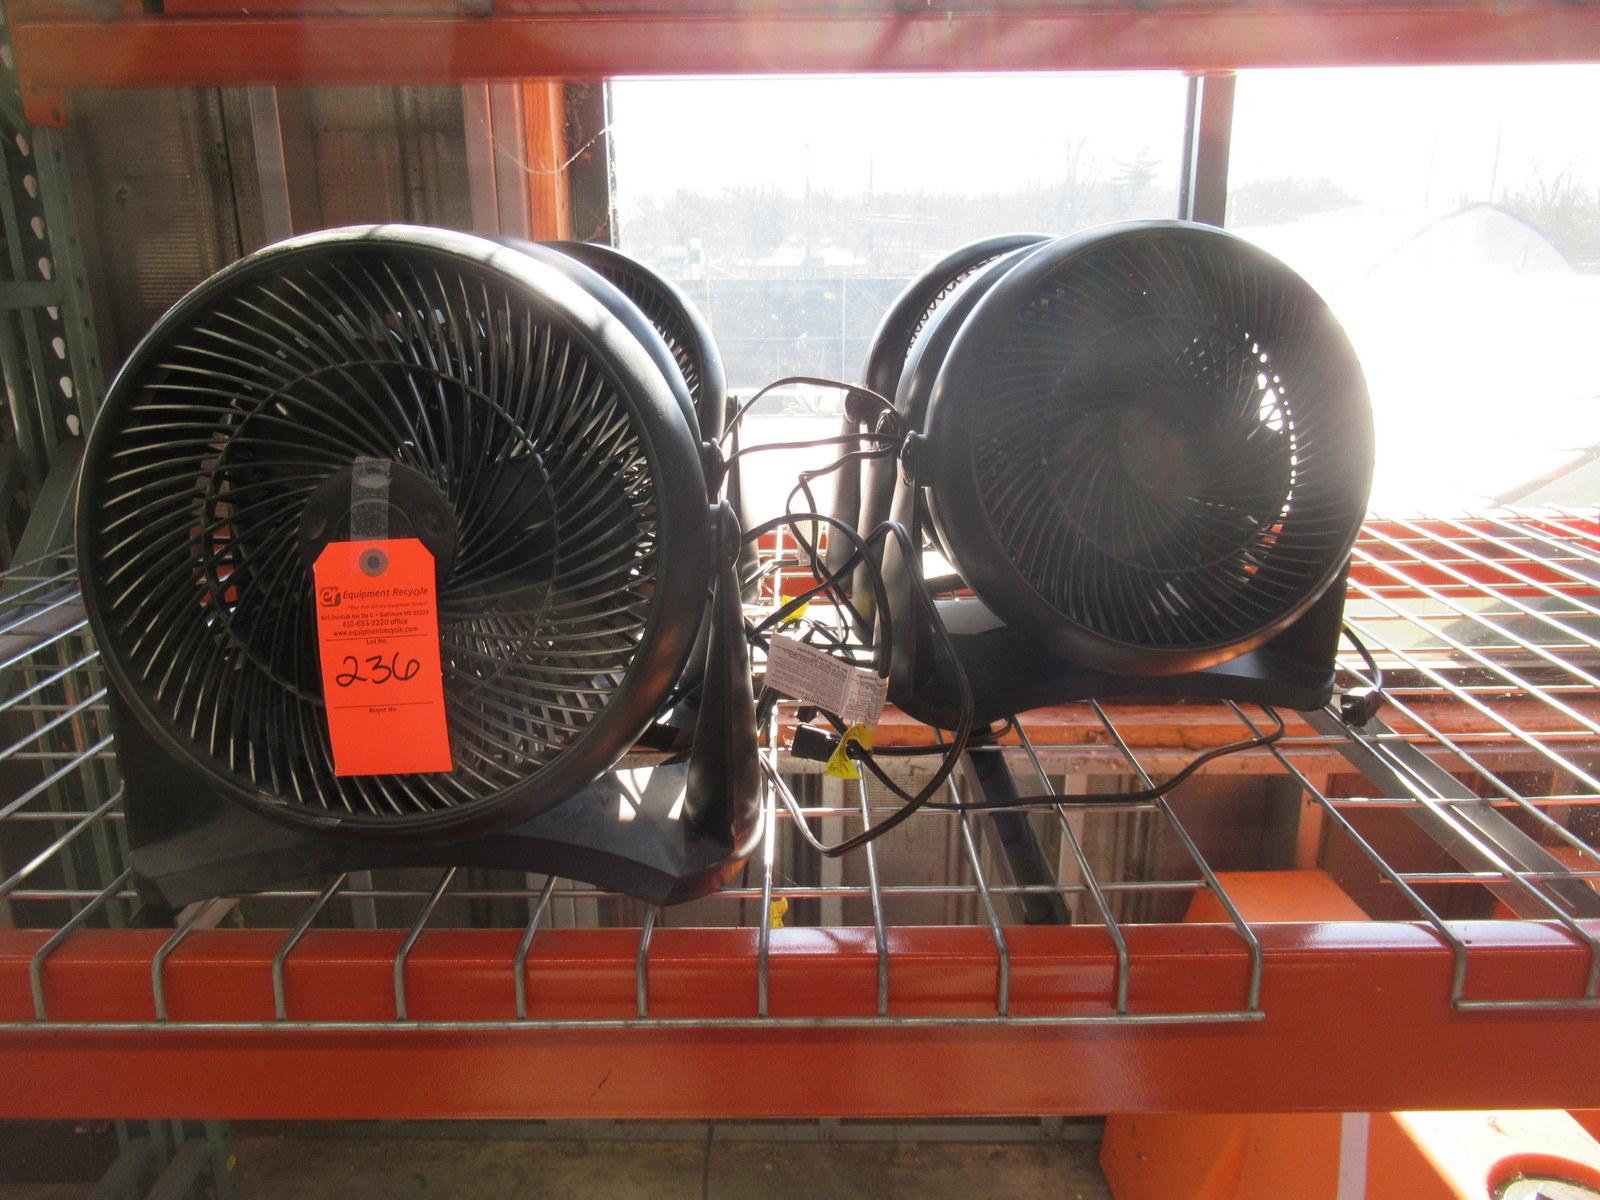 Lot 236 - Honeywell HT-908 Fans Lot of 6